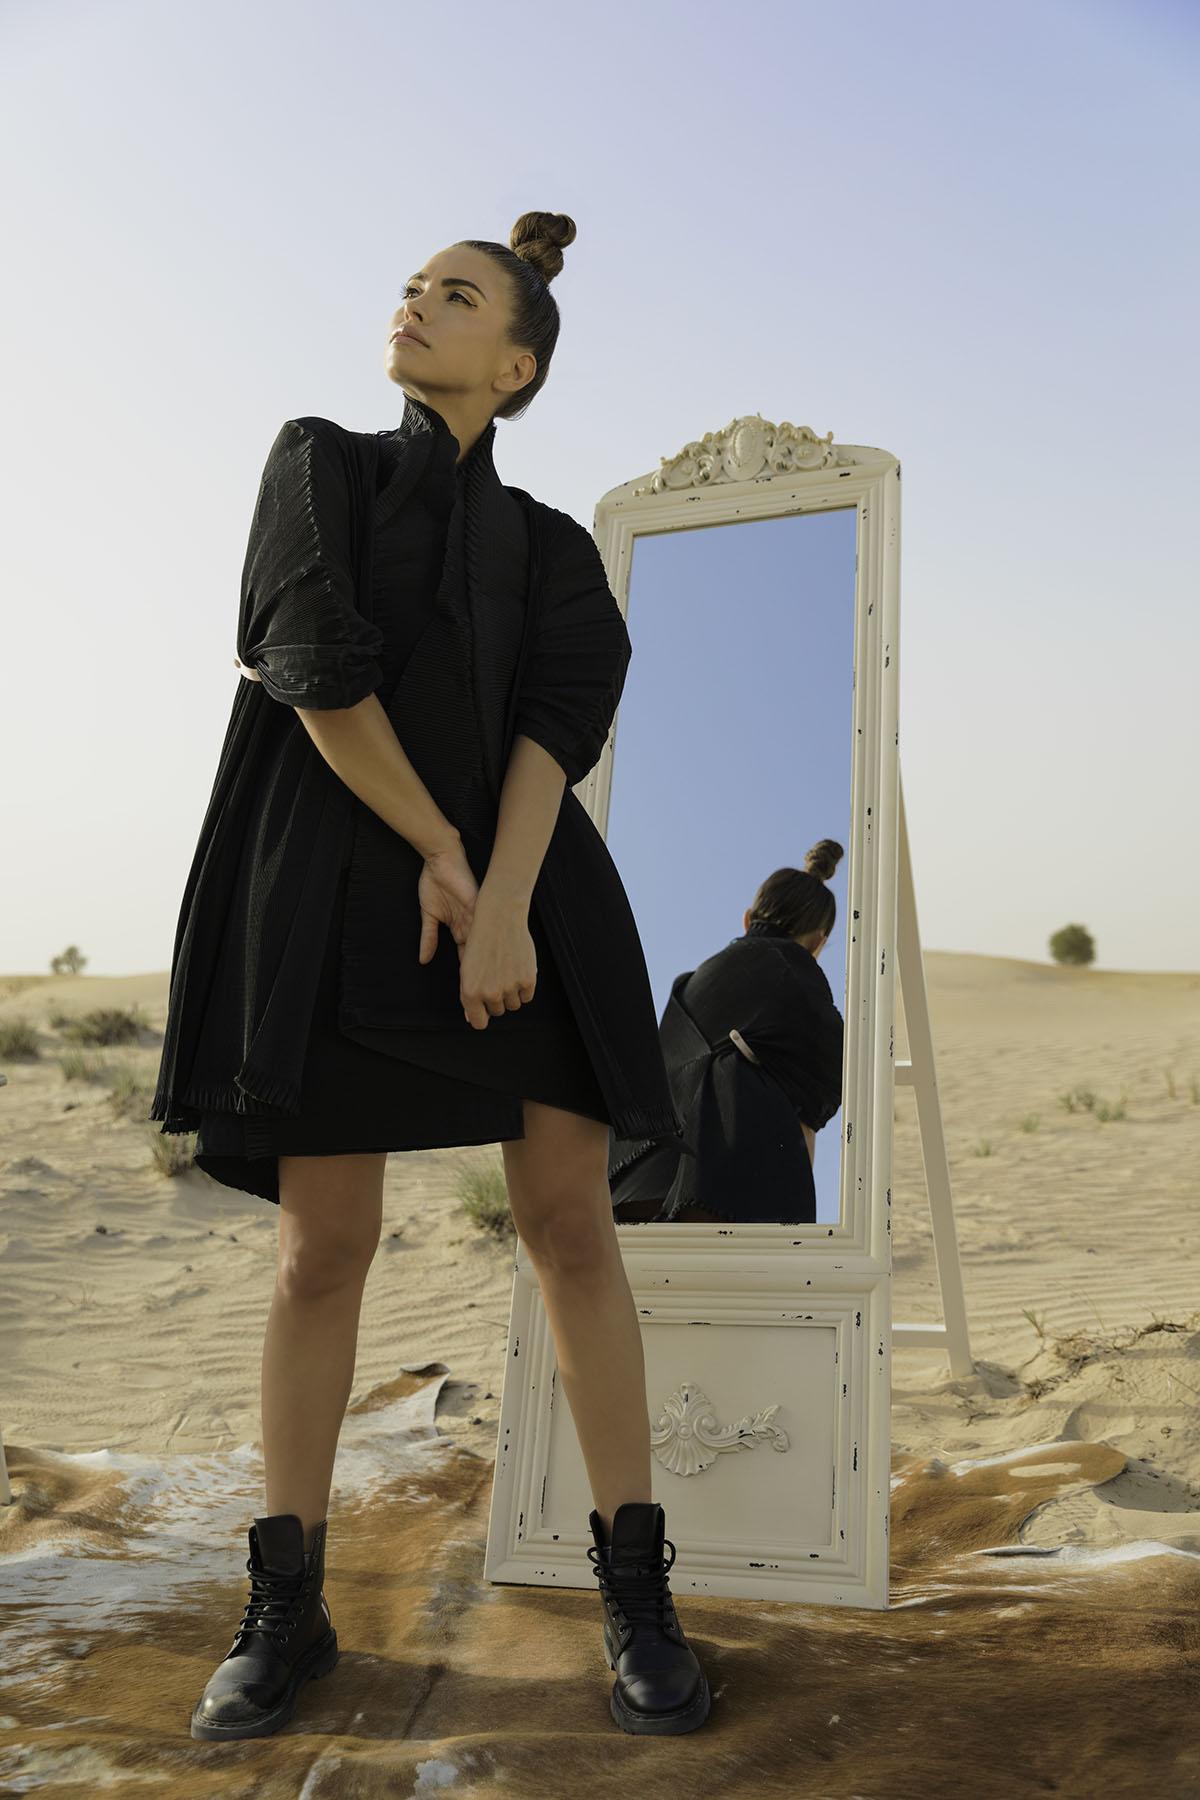 Desert fashion shoot Proshat Sarabloo by Loesje Kessels Fashion Photographer Dubai